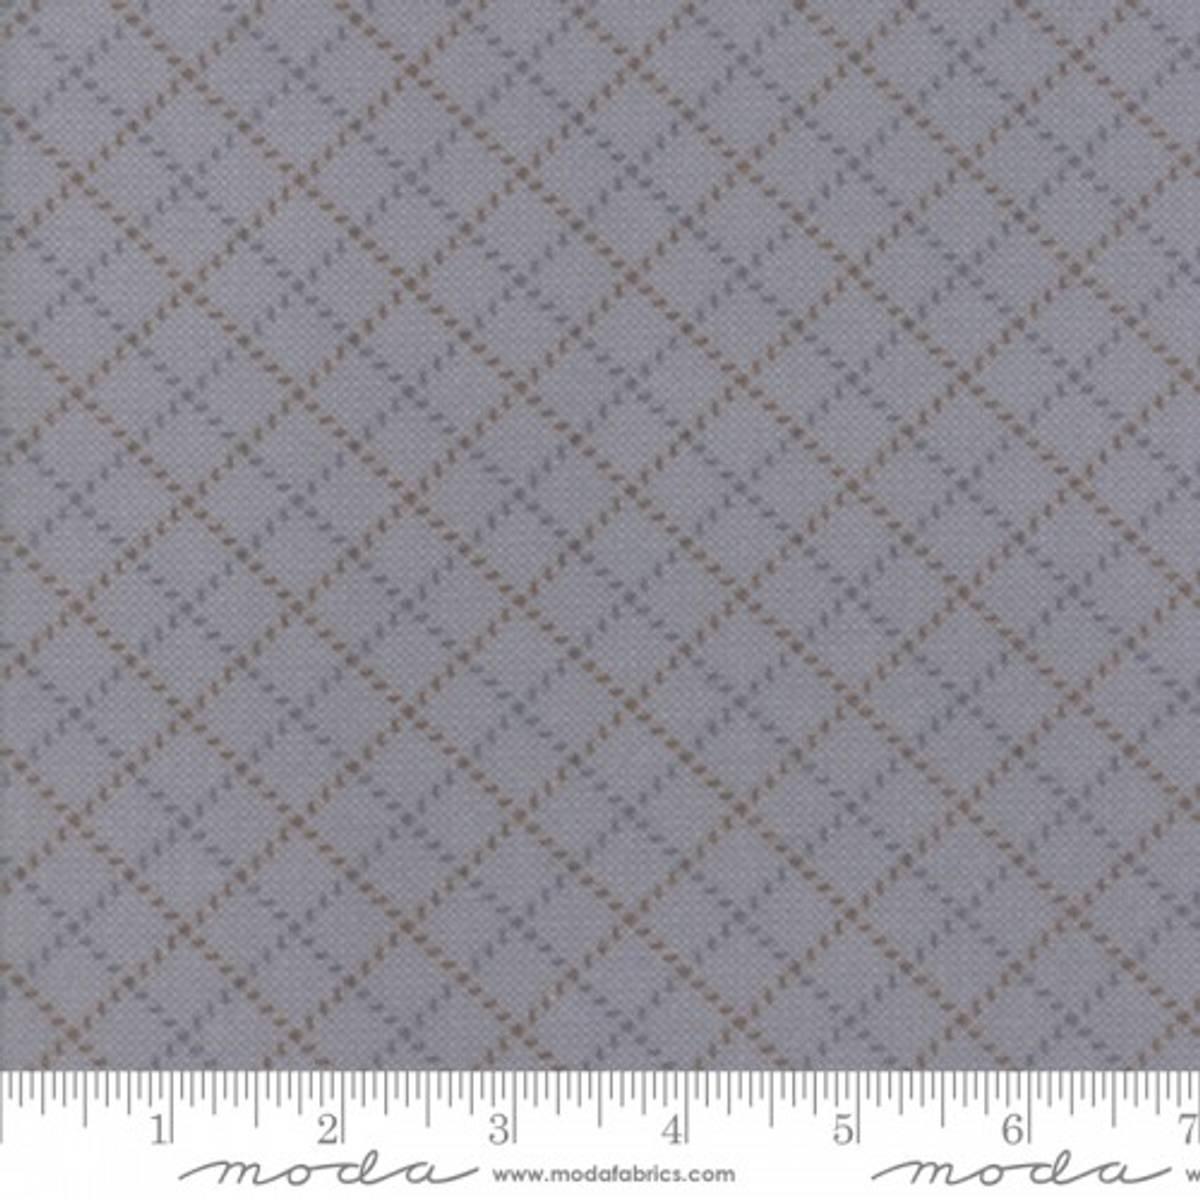 Moda Fabrics Farmhouse Flannels II, 49105 12F